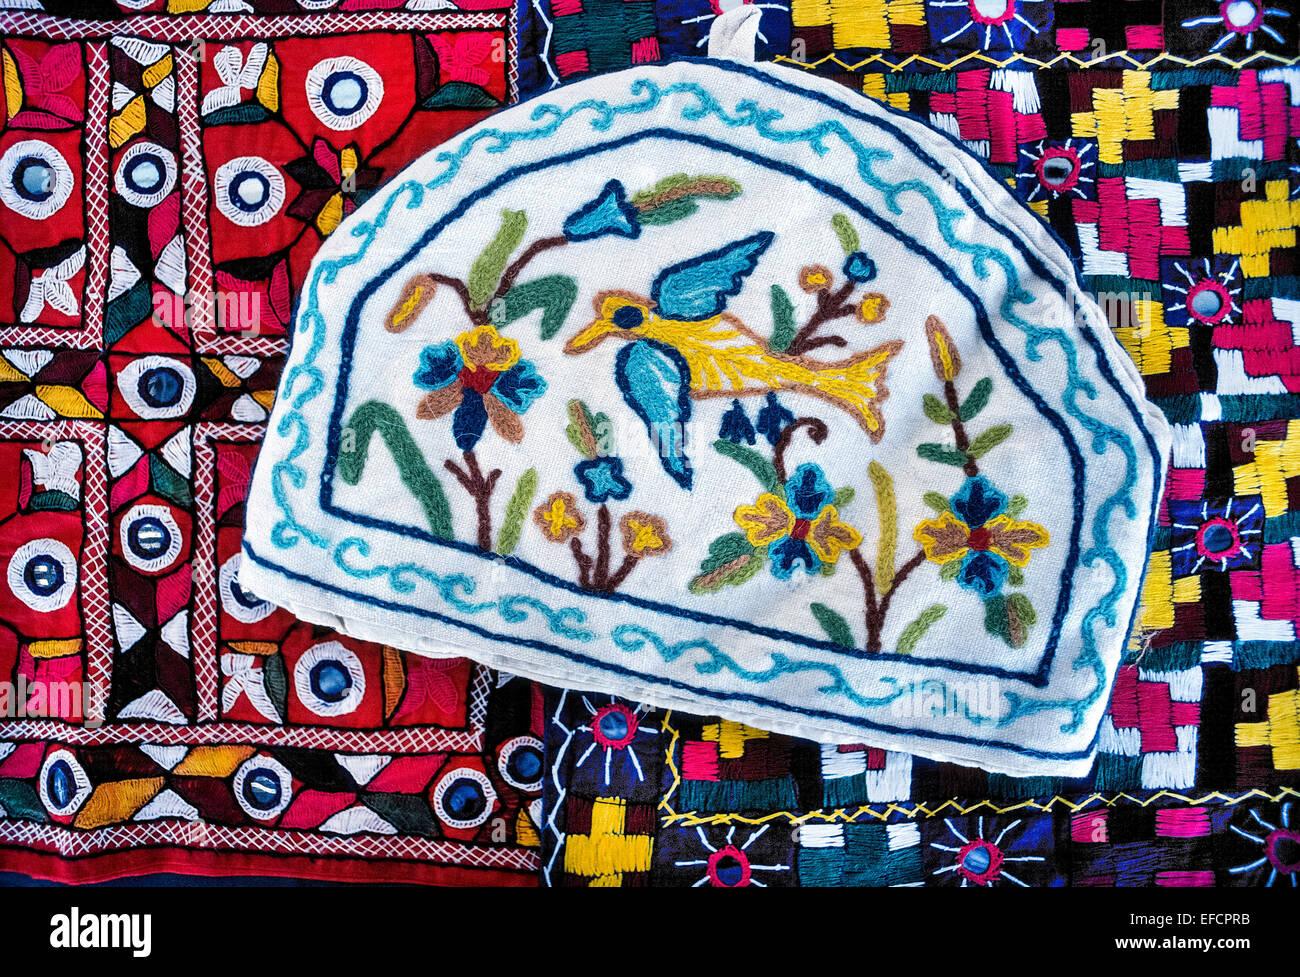 Souvenirs Textiles Stockfotos & Souvenirs Textiles Bilder - Alamy